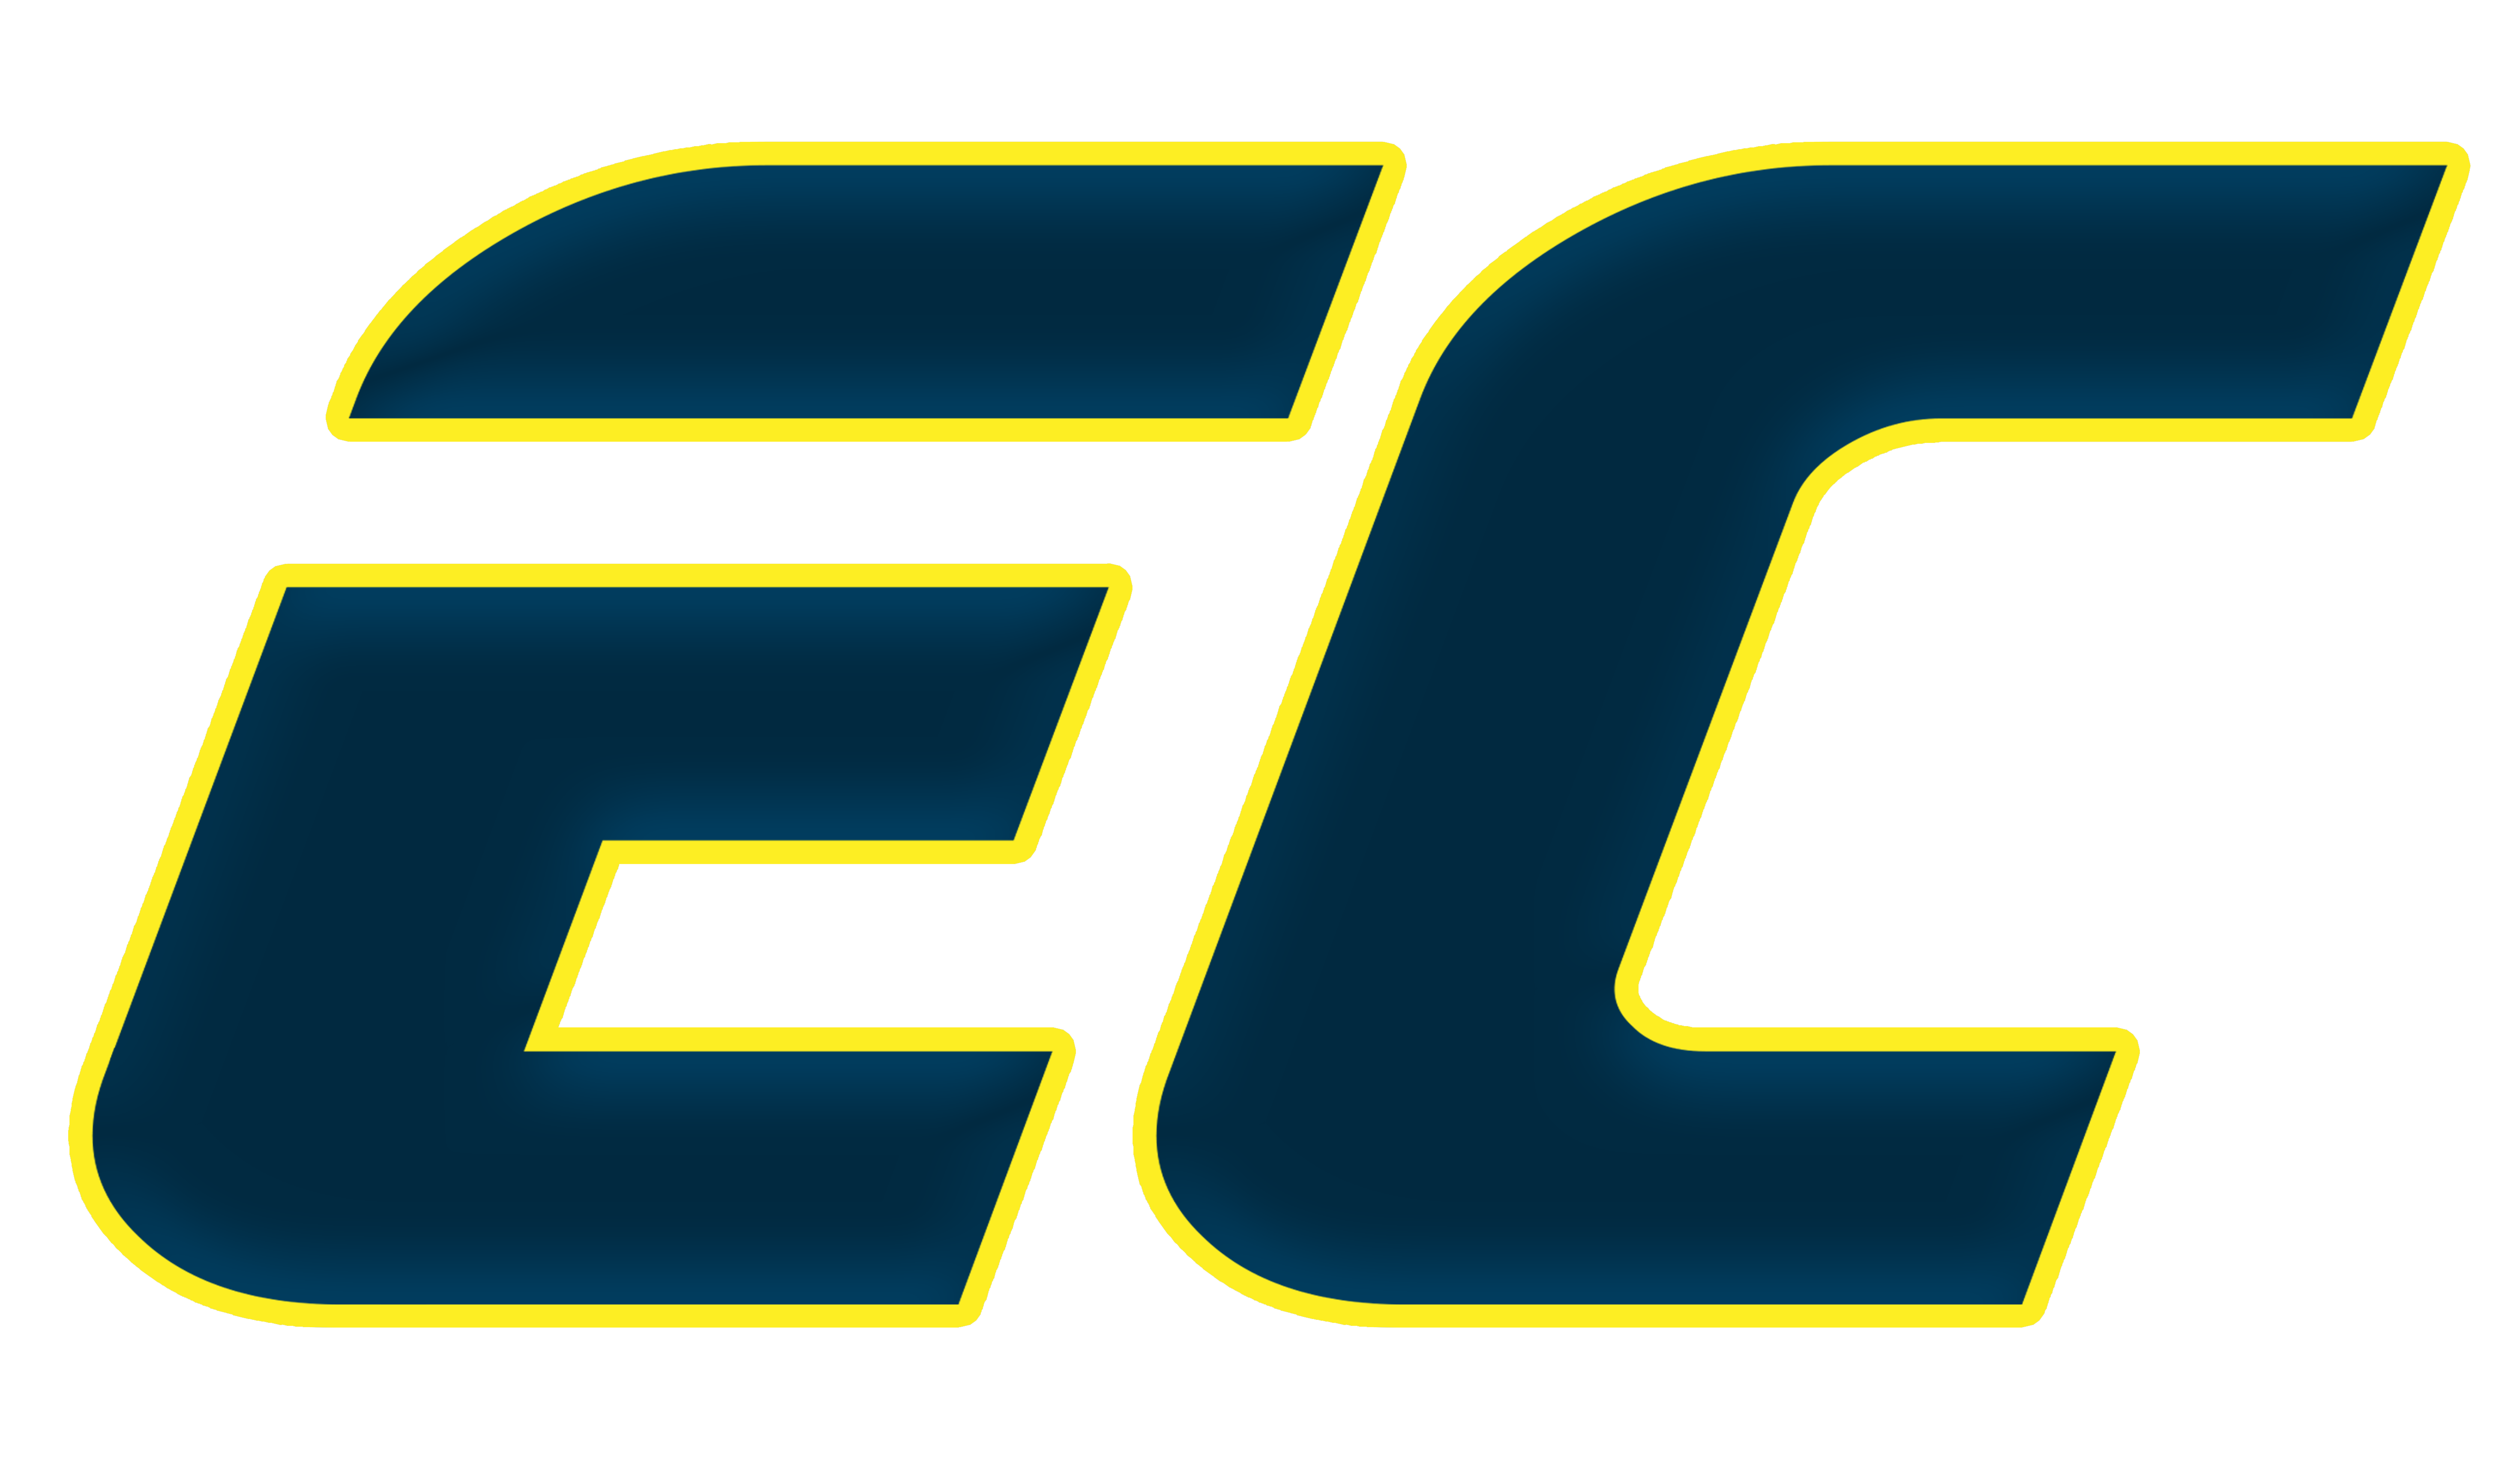 EJSMOND CLUB